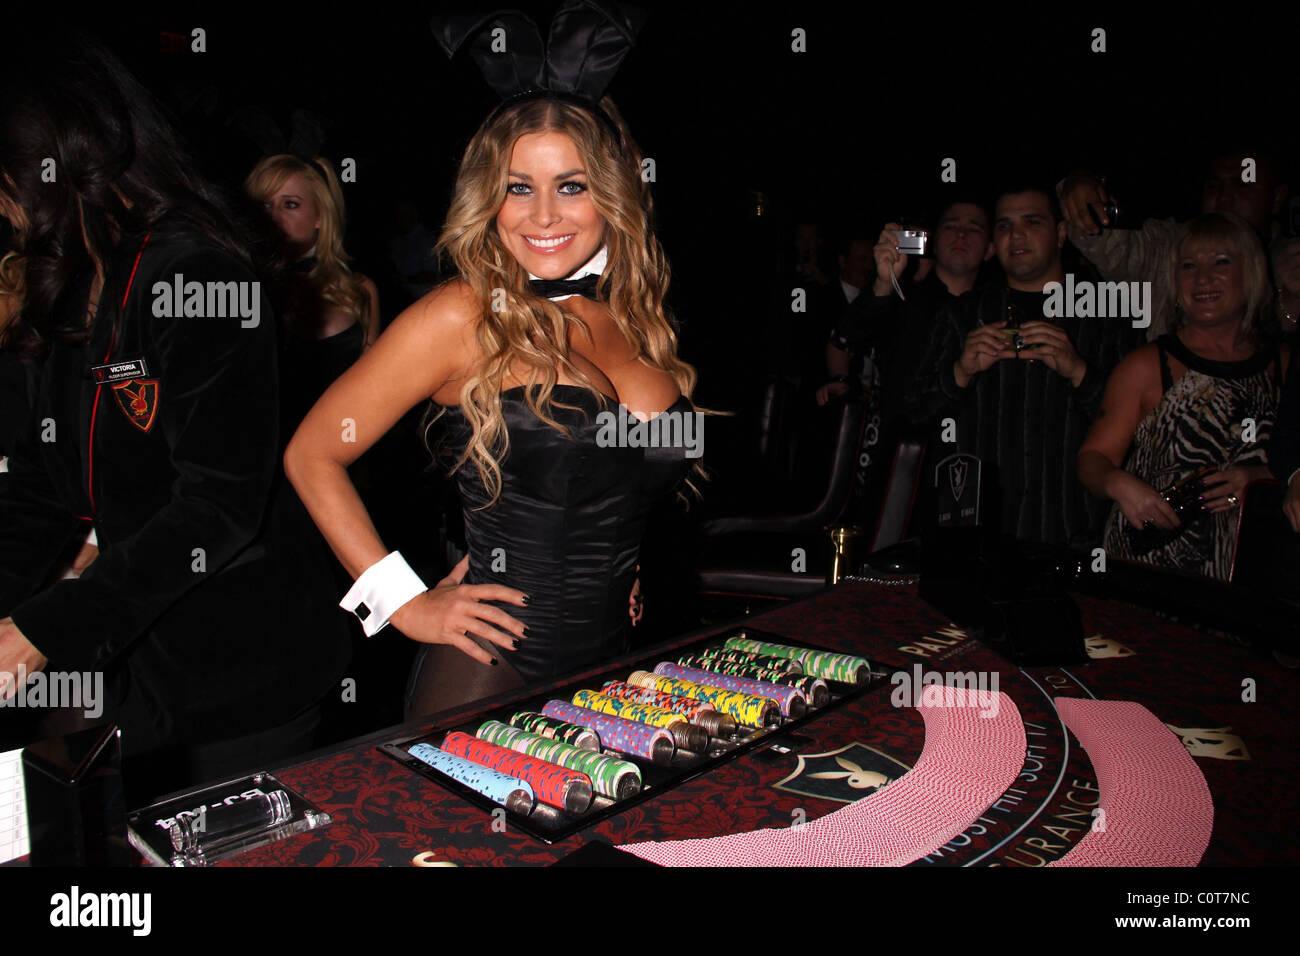 Vegas playboy casino 18 gambling arizona